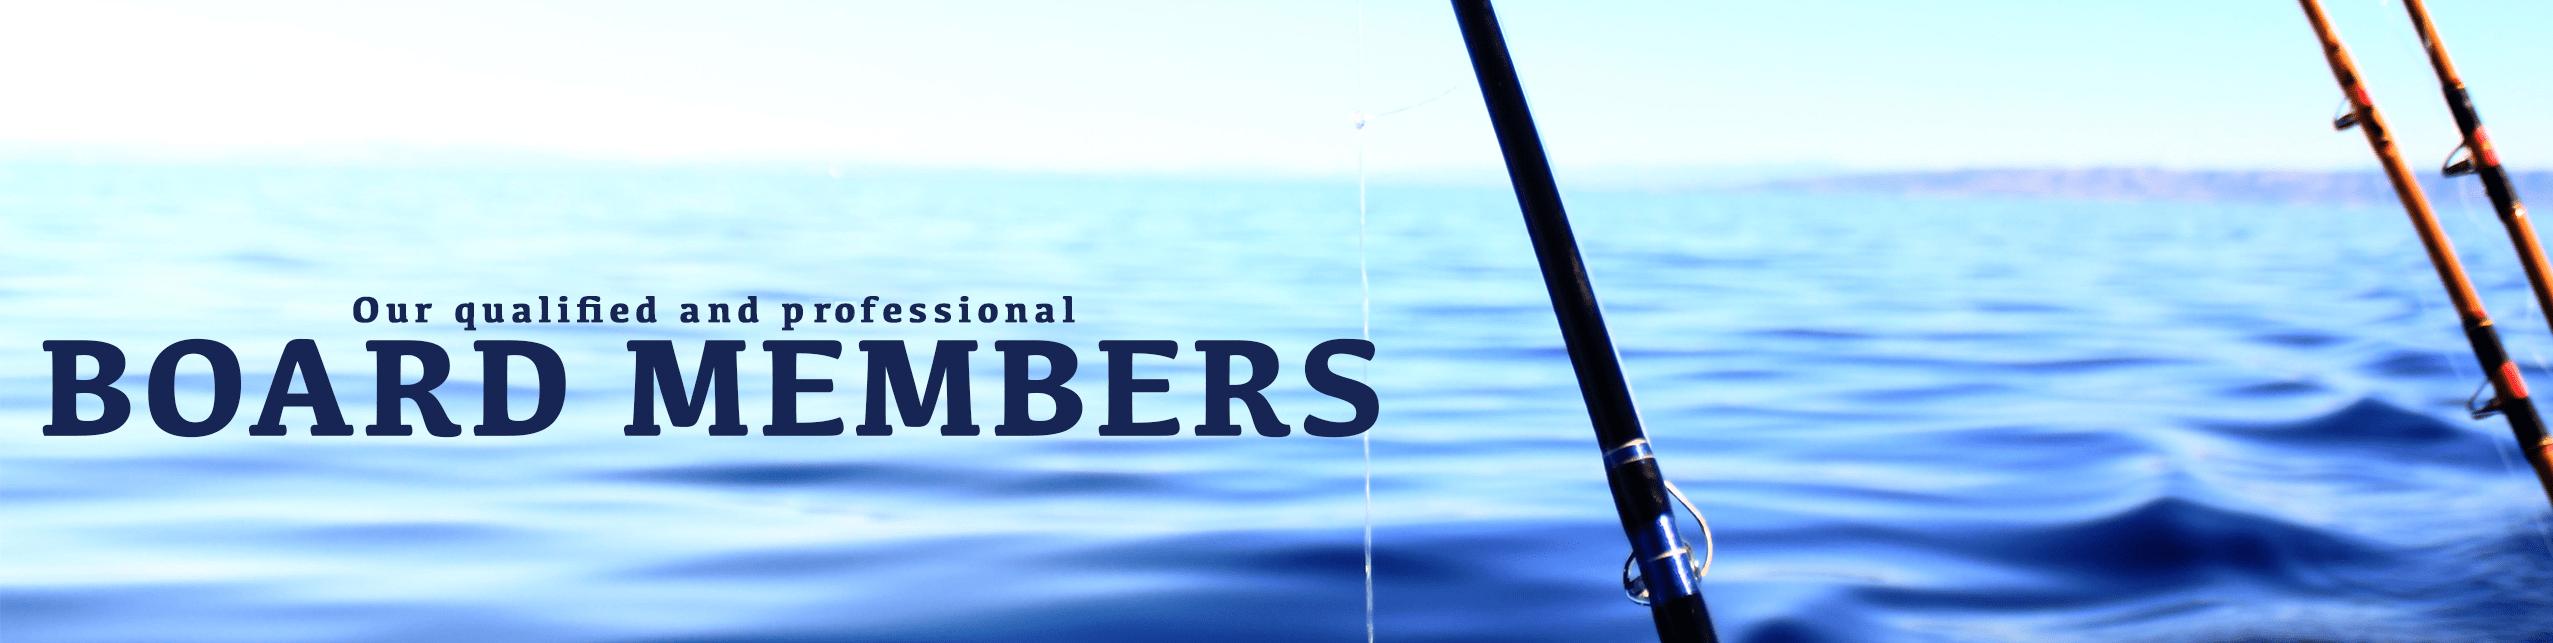 boardmembers-banner.png